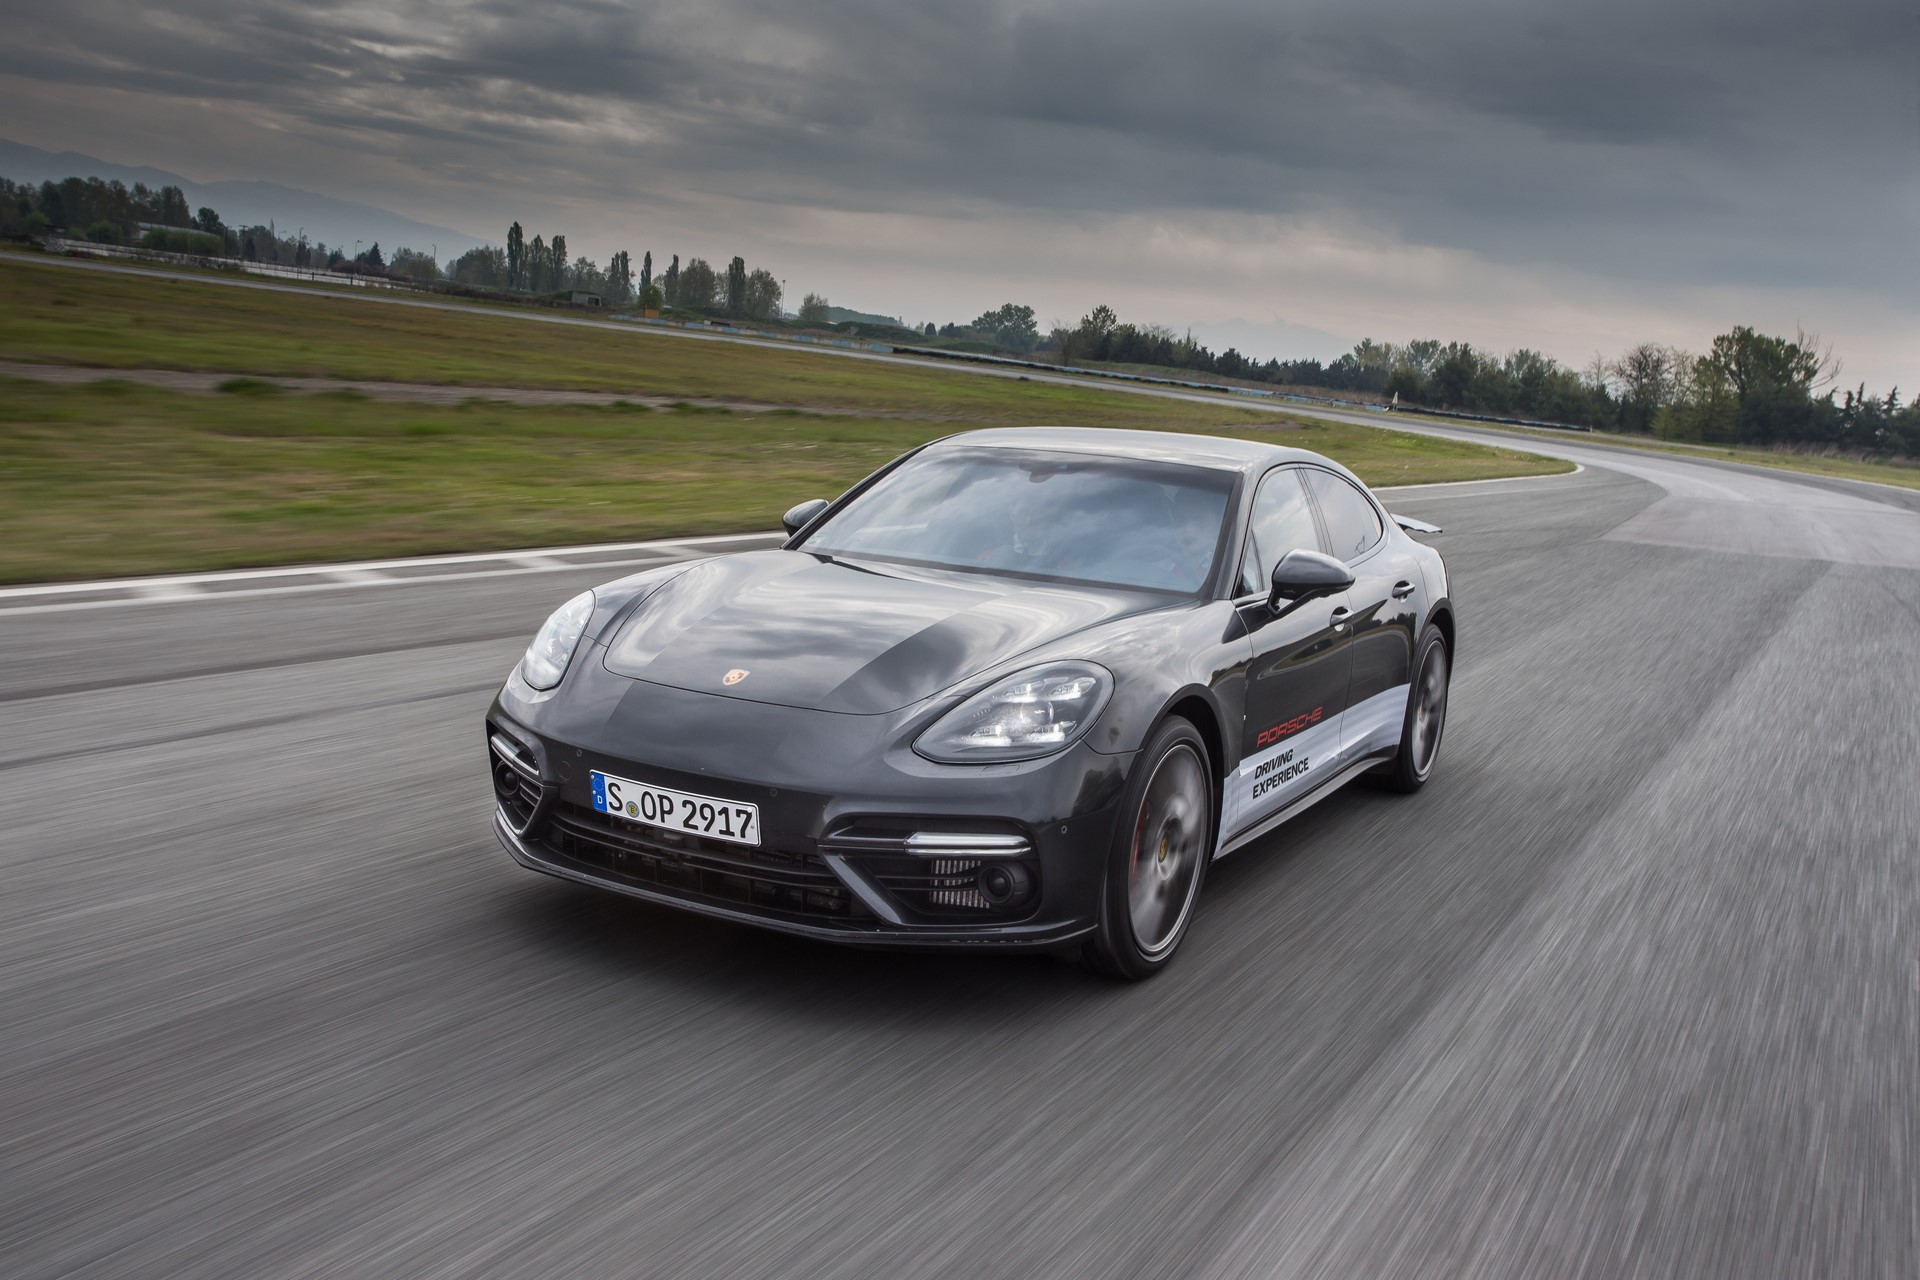 Porsche Driving Experience 2017 Serres (45)